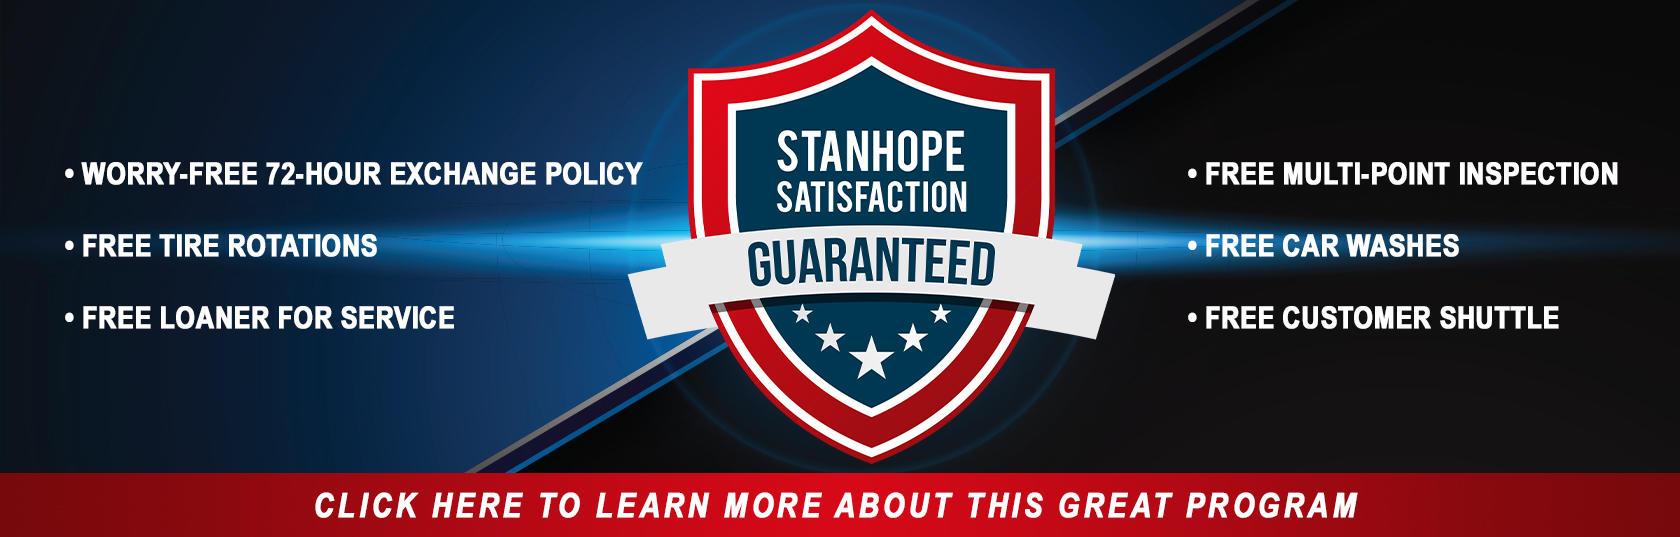 Stanhope Satisfaction Banner